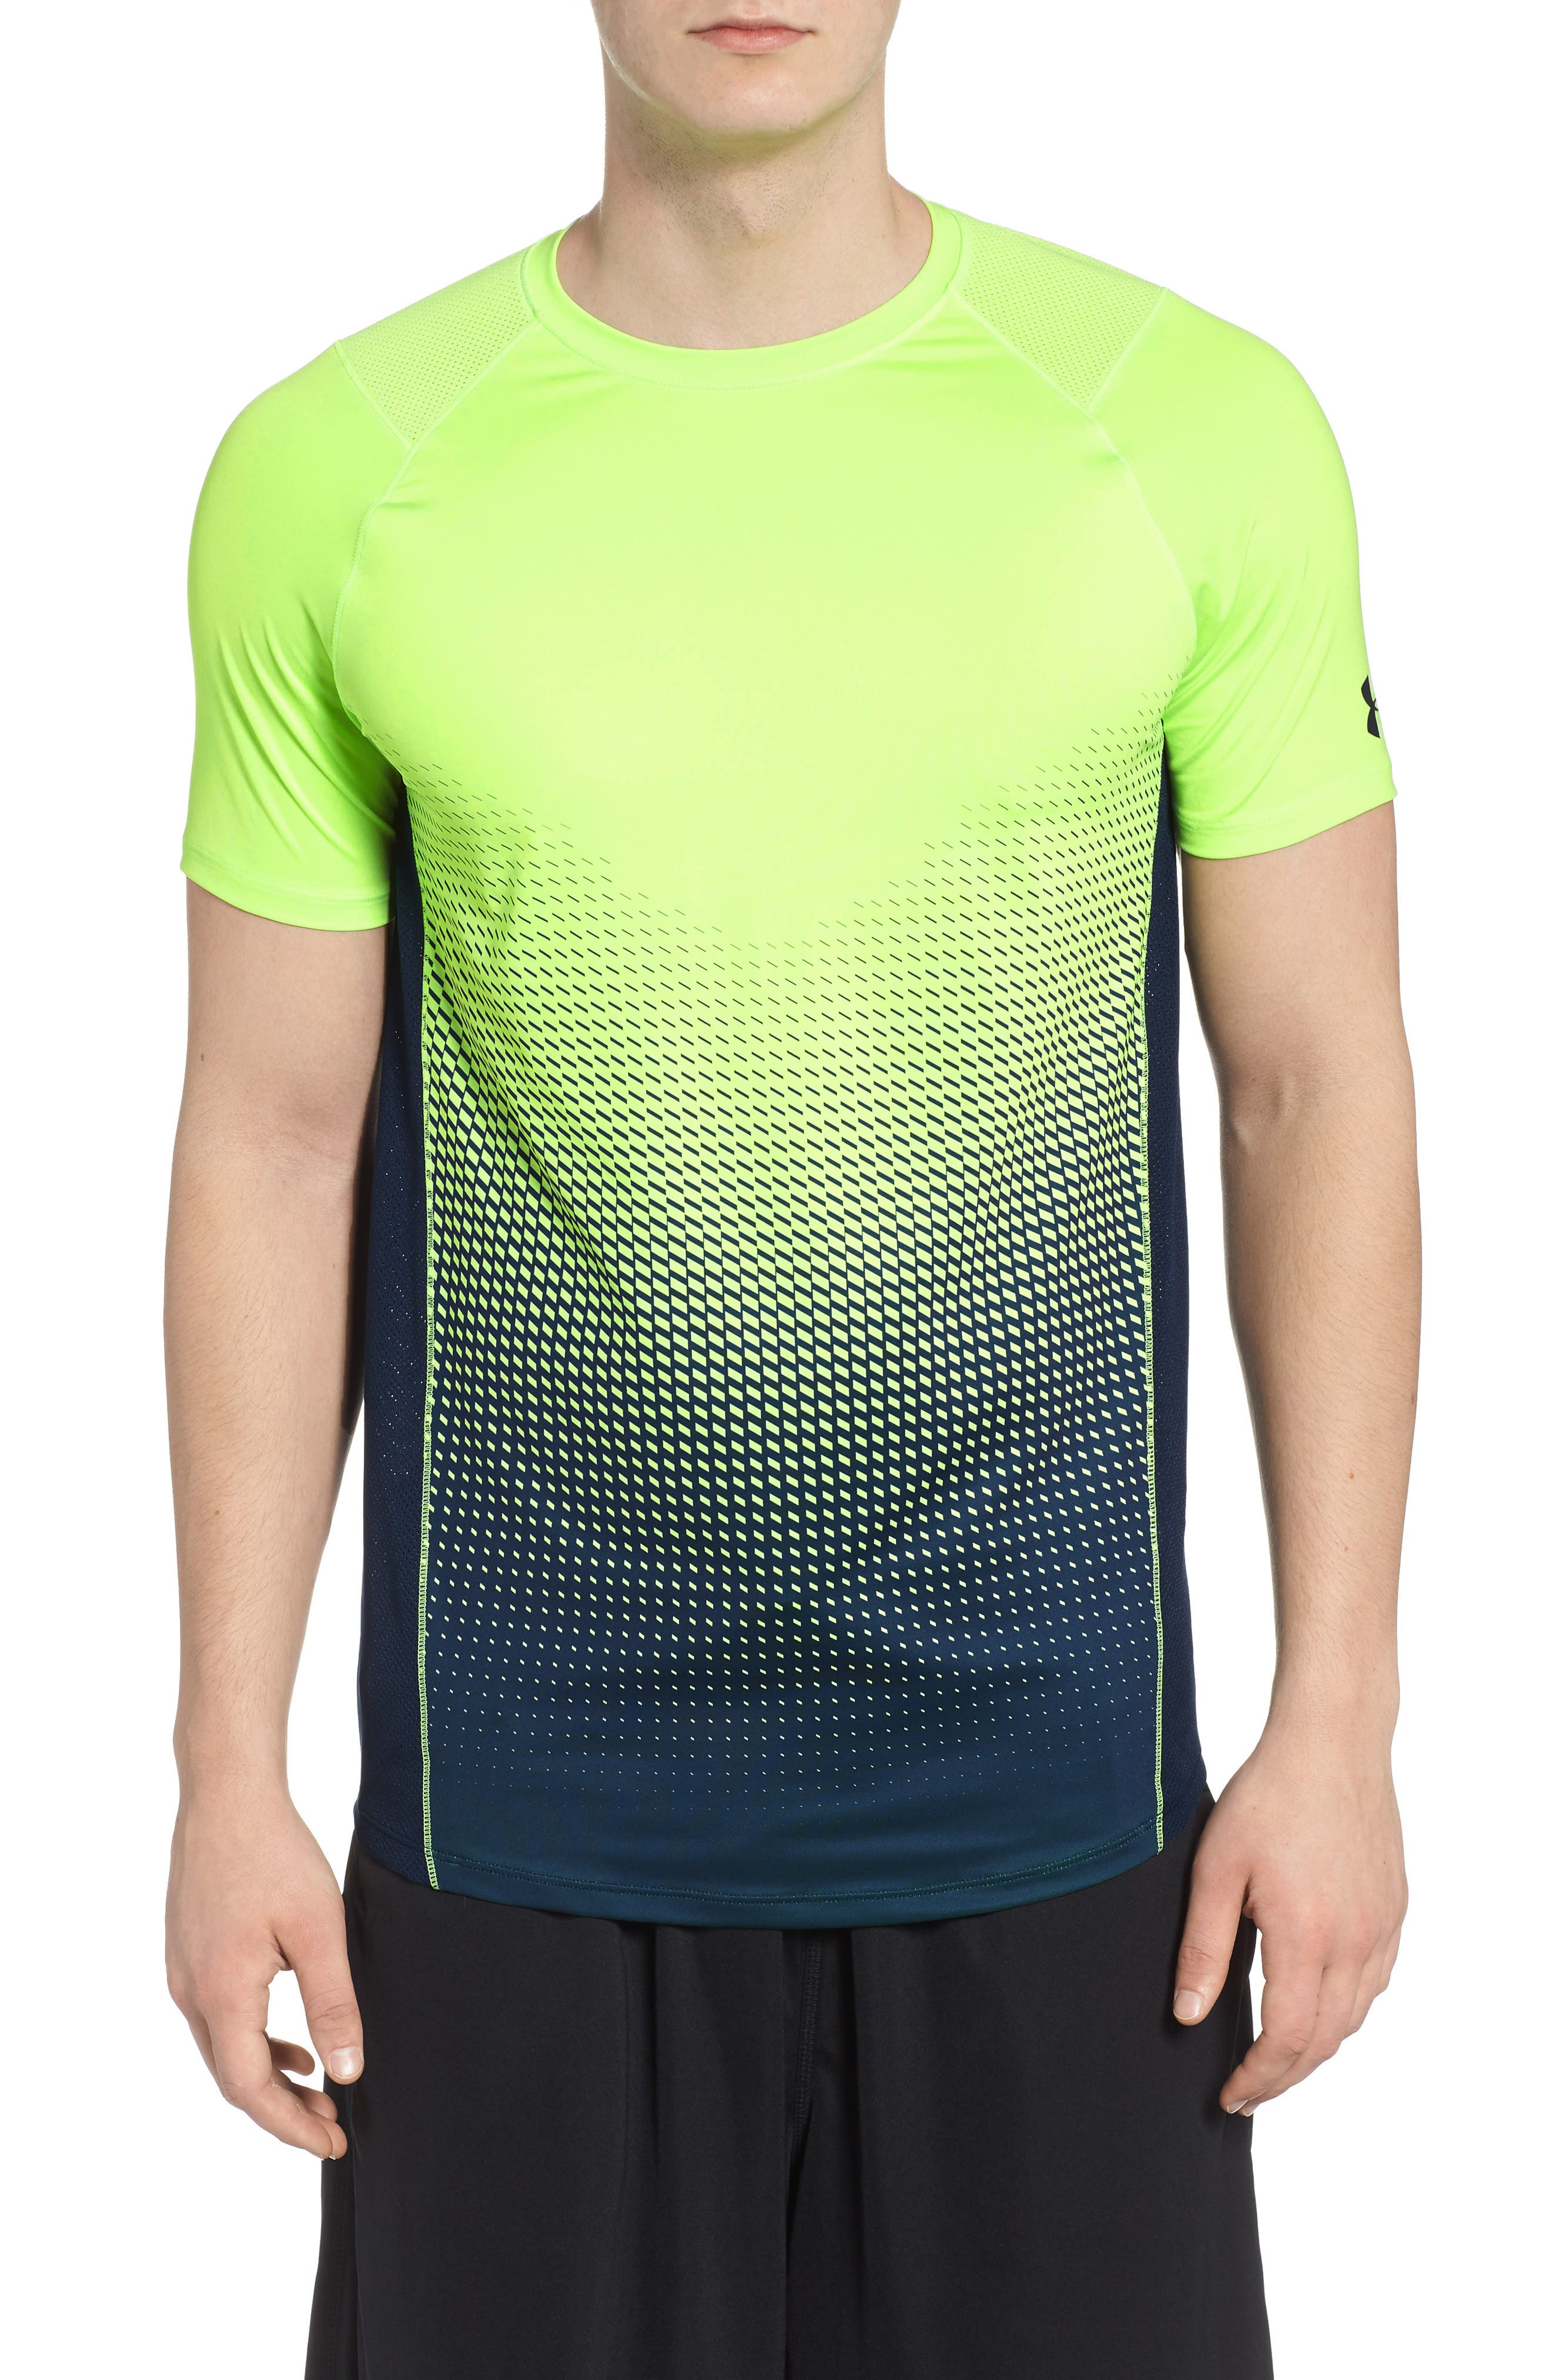 MK1 Dash Crewneck T-Shirt,                         Main,                         color, Lime / Academy / Graphite